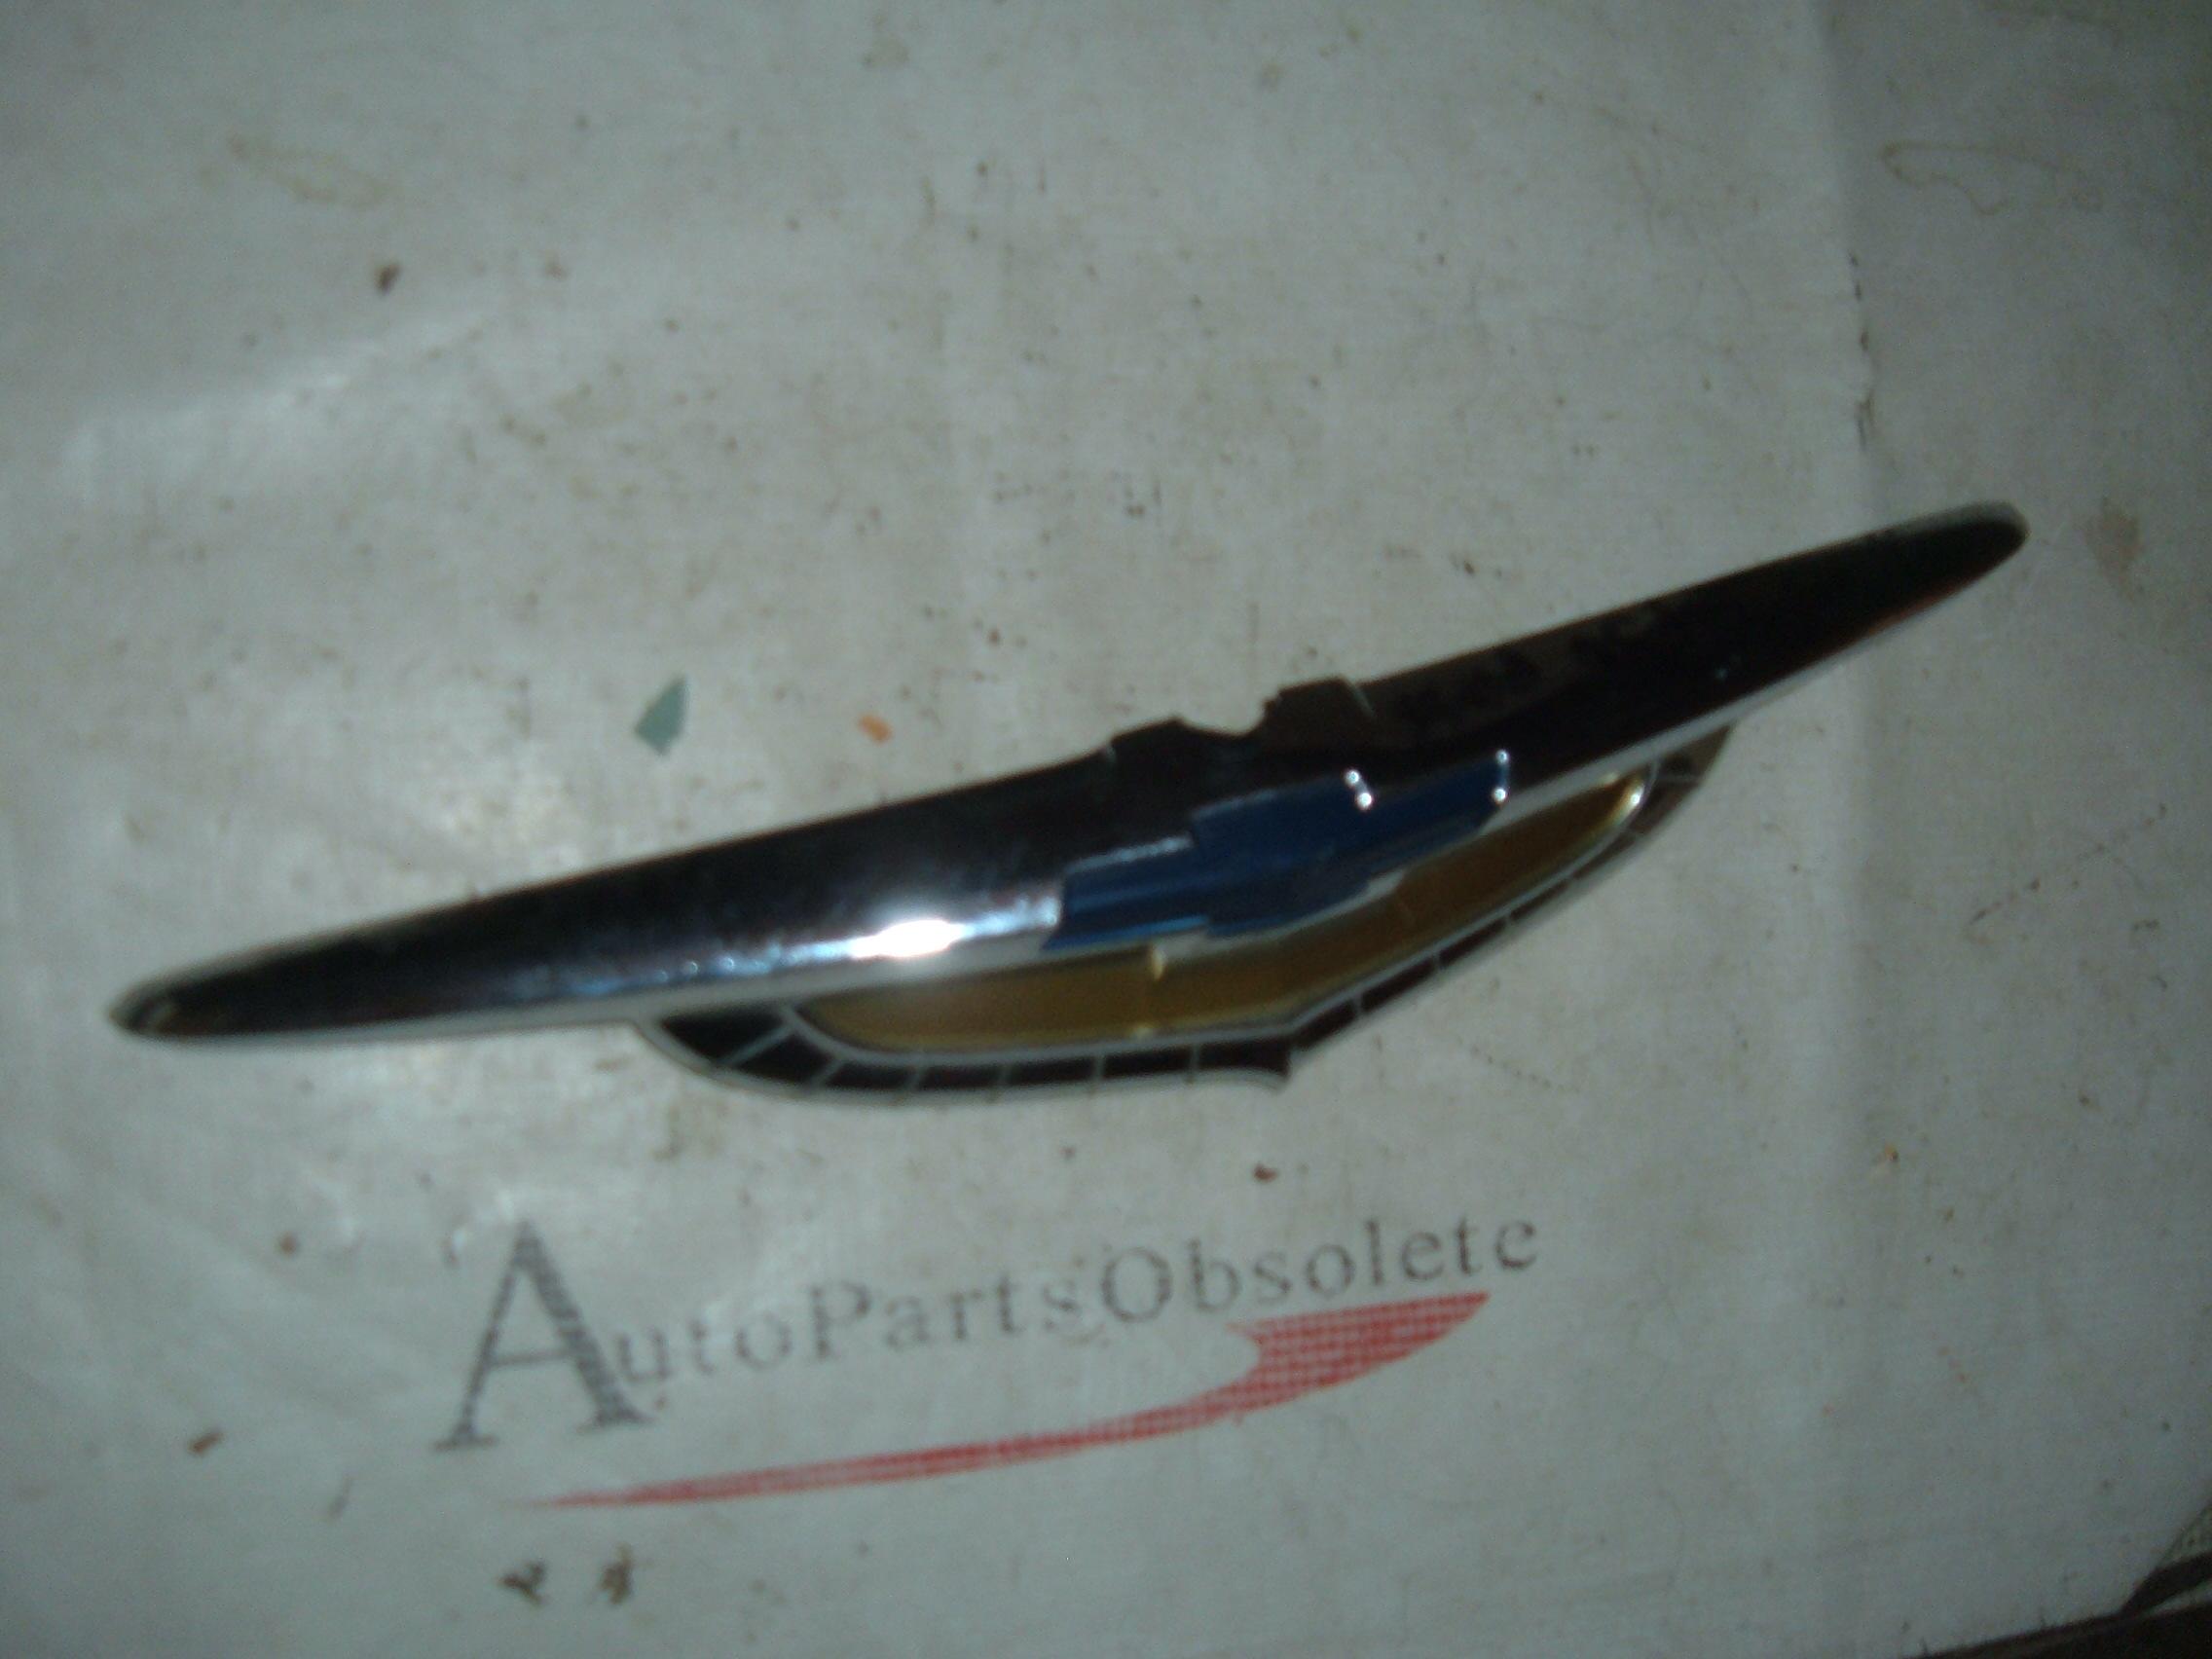 1950 chevrolet hood ornament gm # 3693312 (z 3693312)